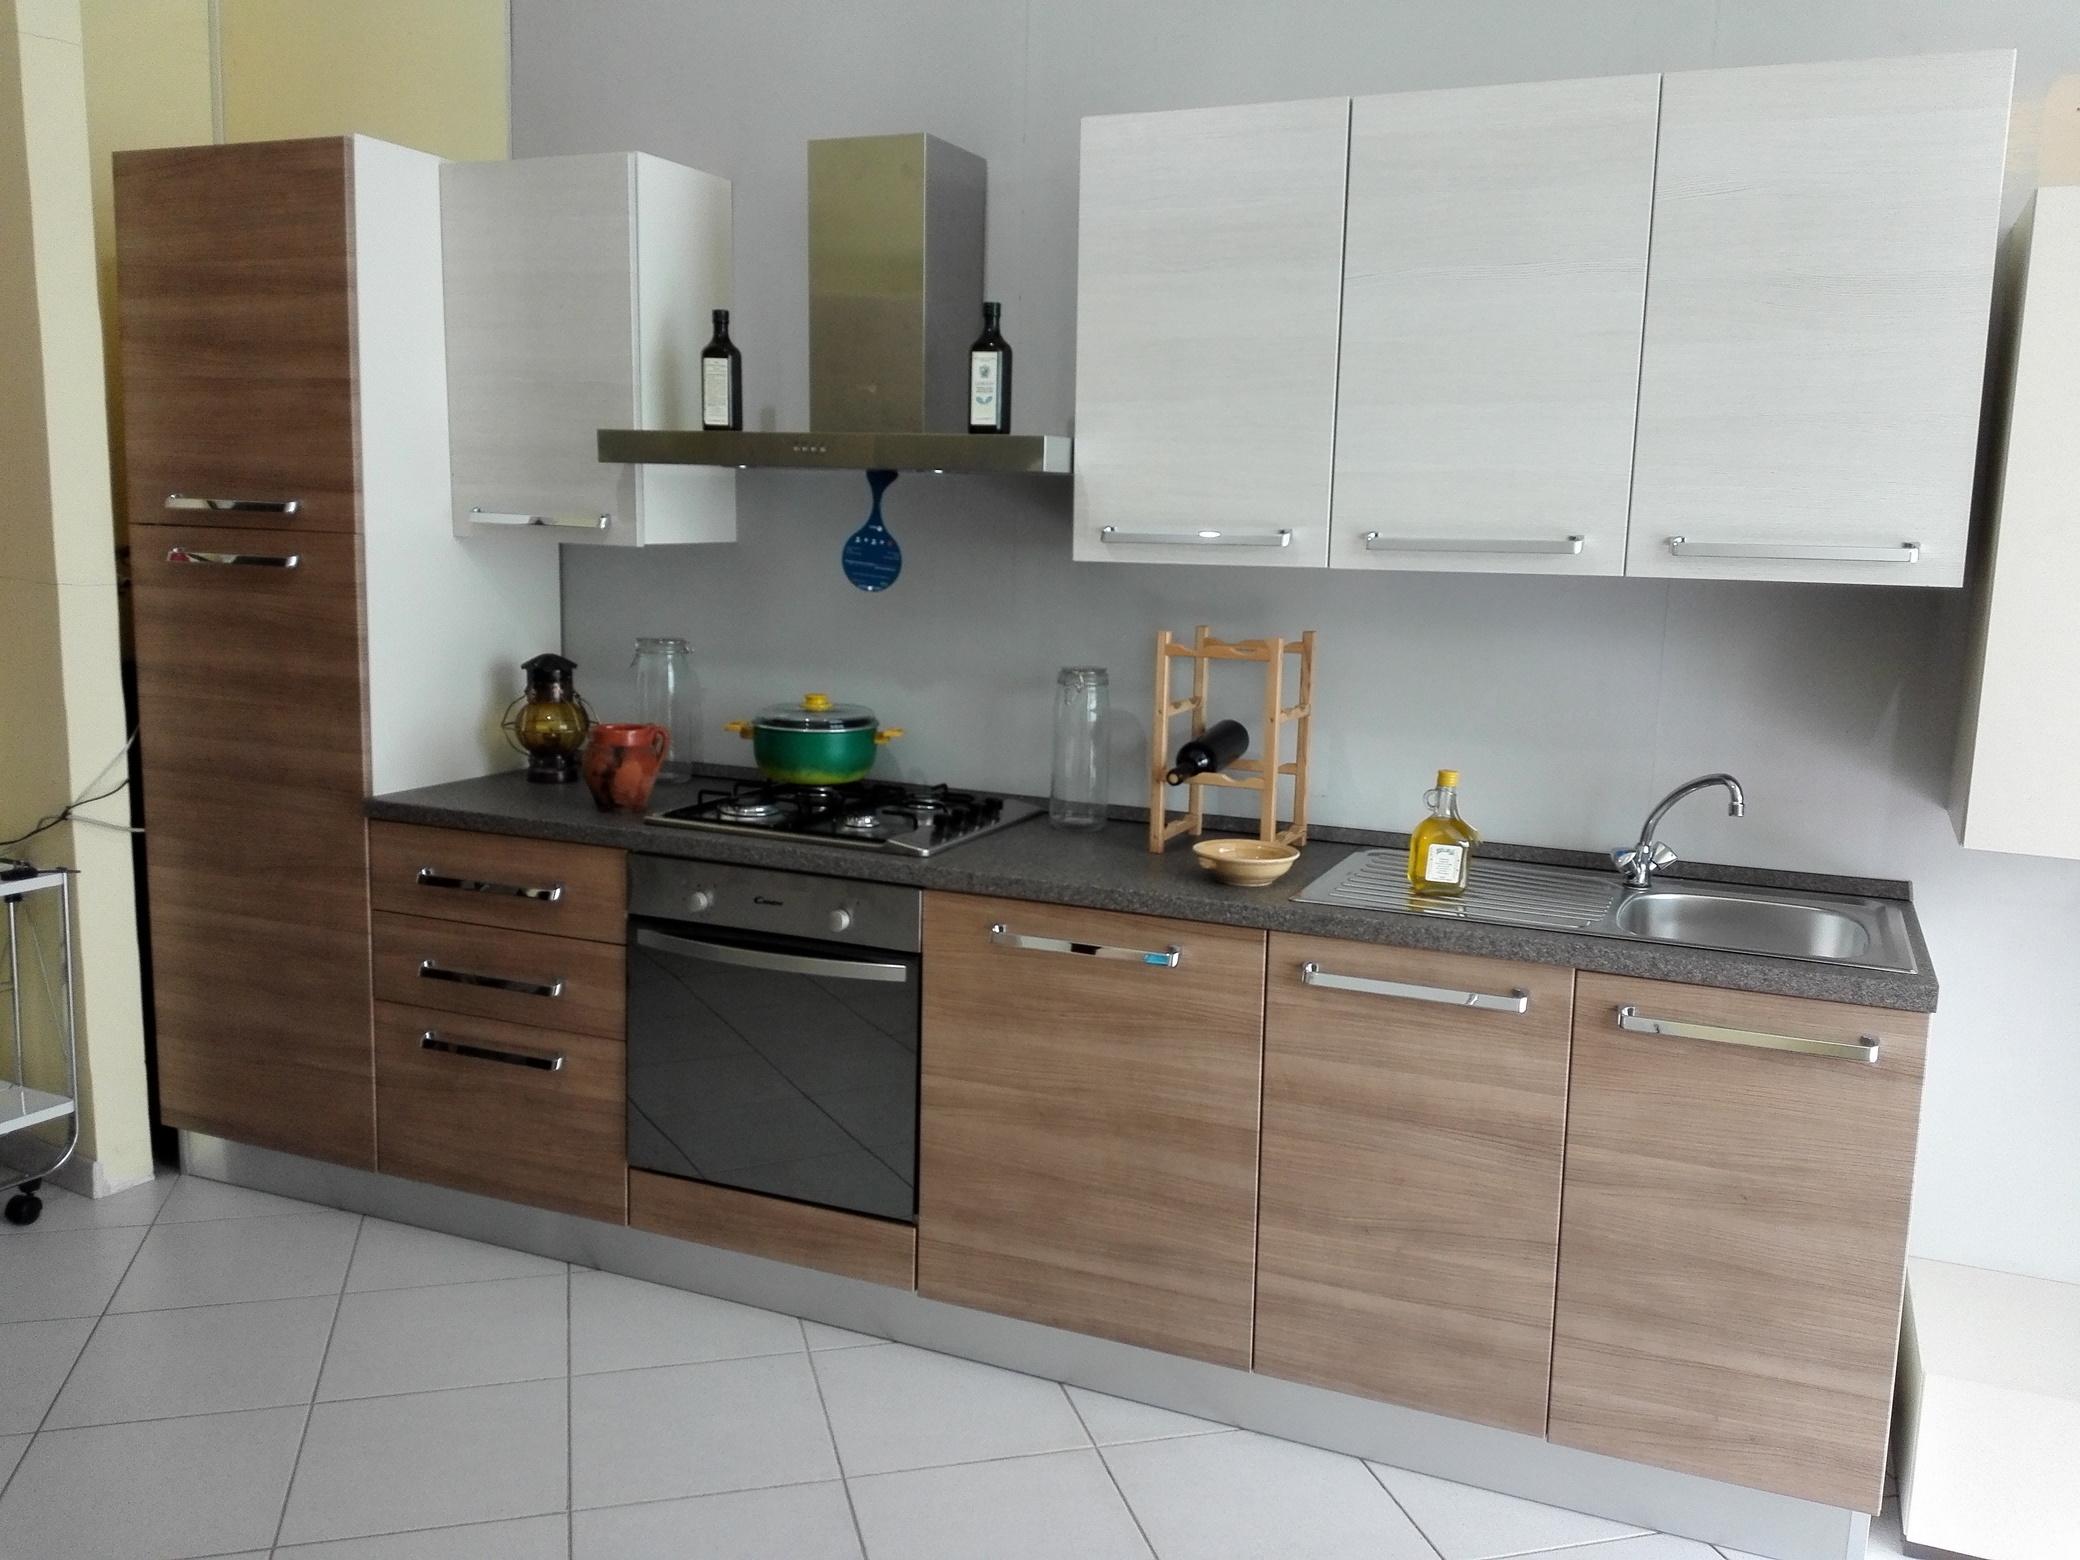 Brio cucina moderna con elettrodomestici by mobilturi - Arredare una cucina moderna ...